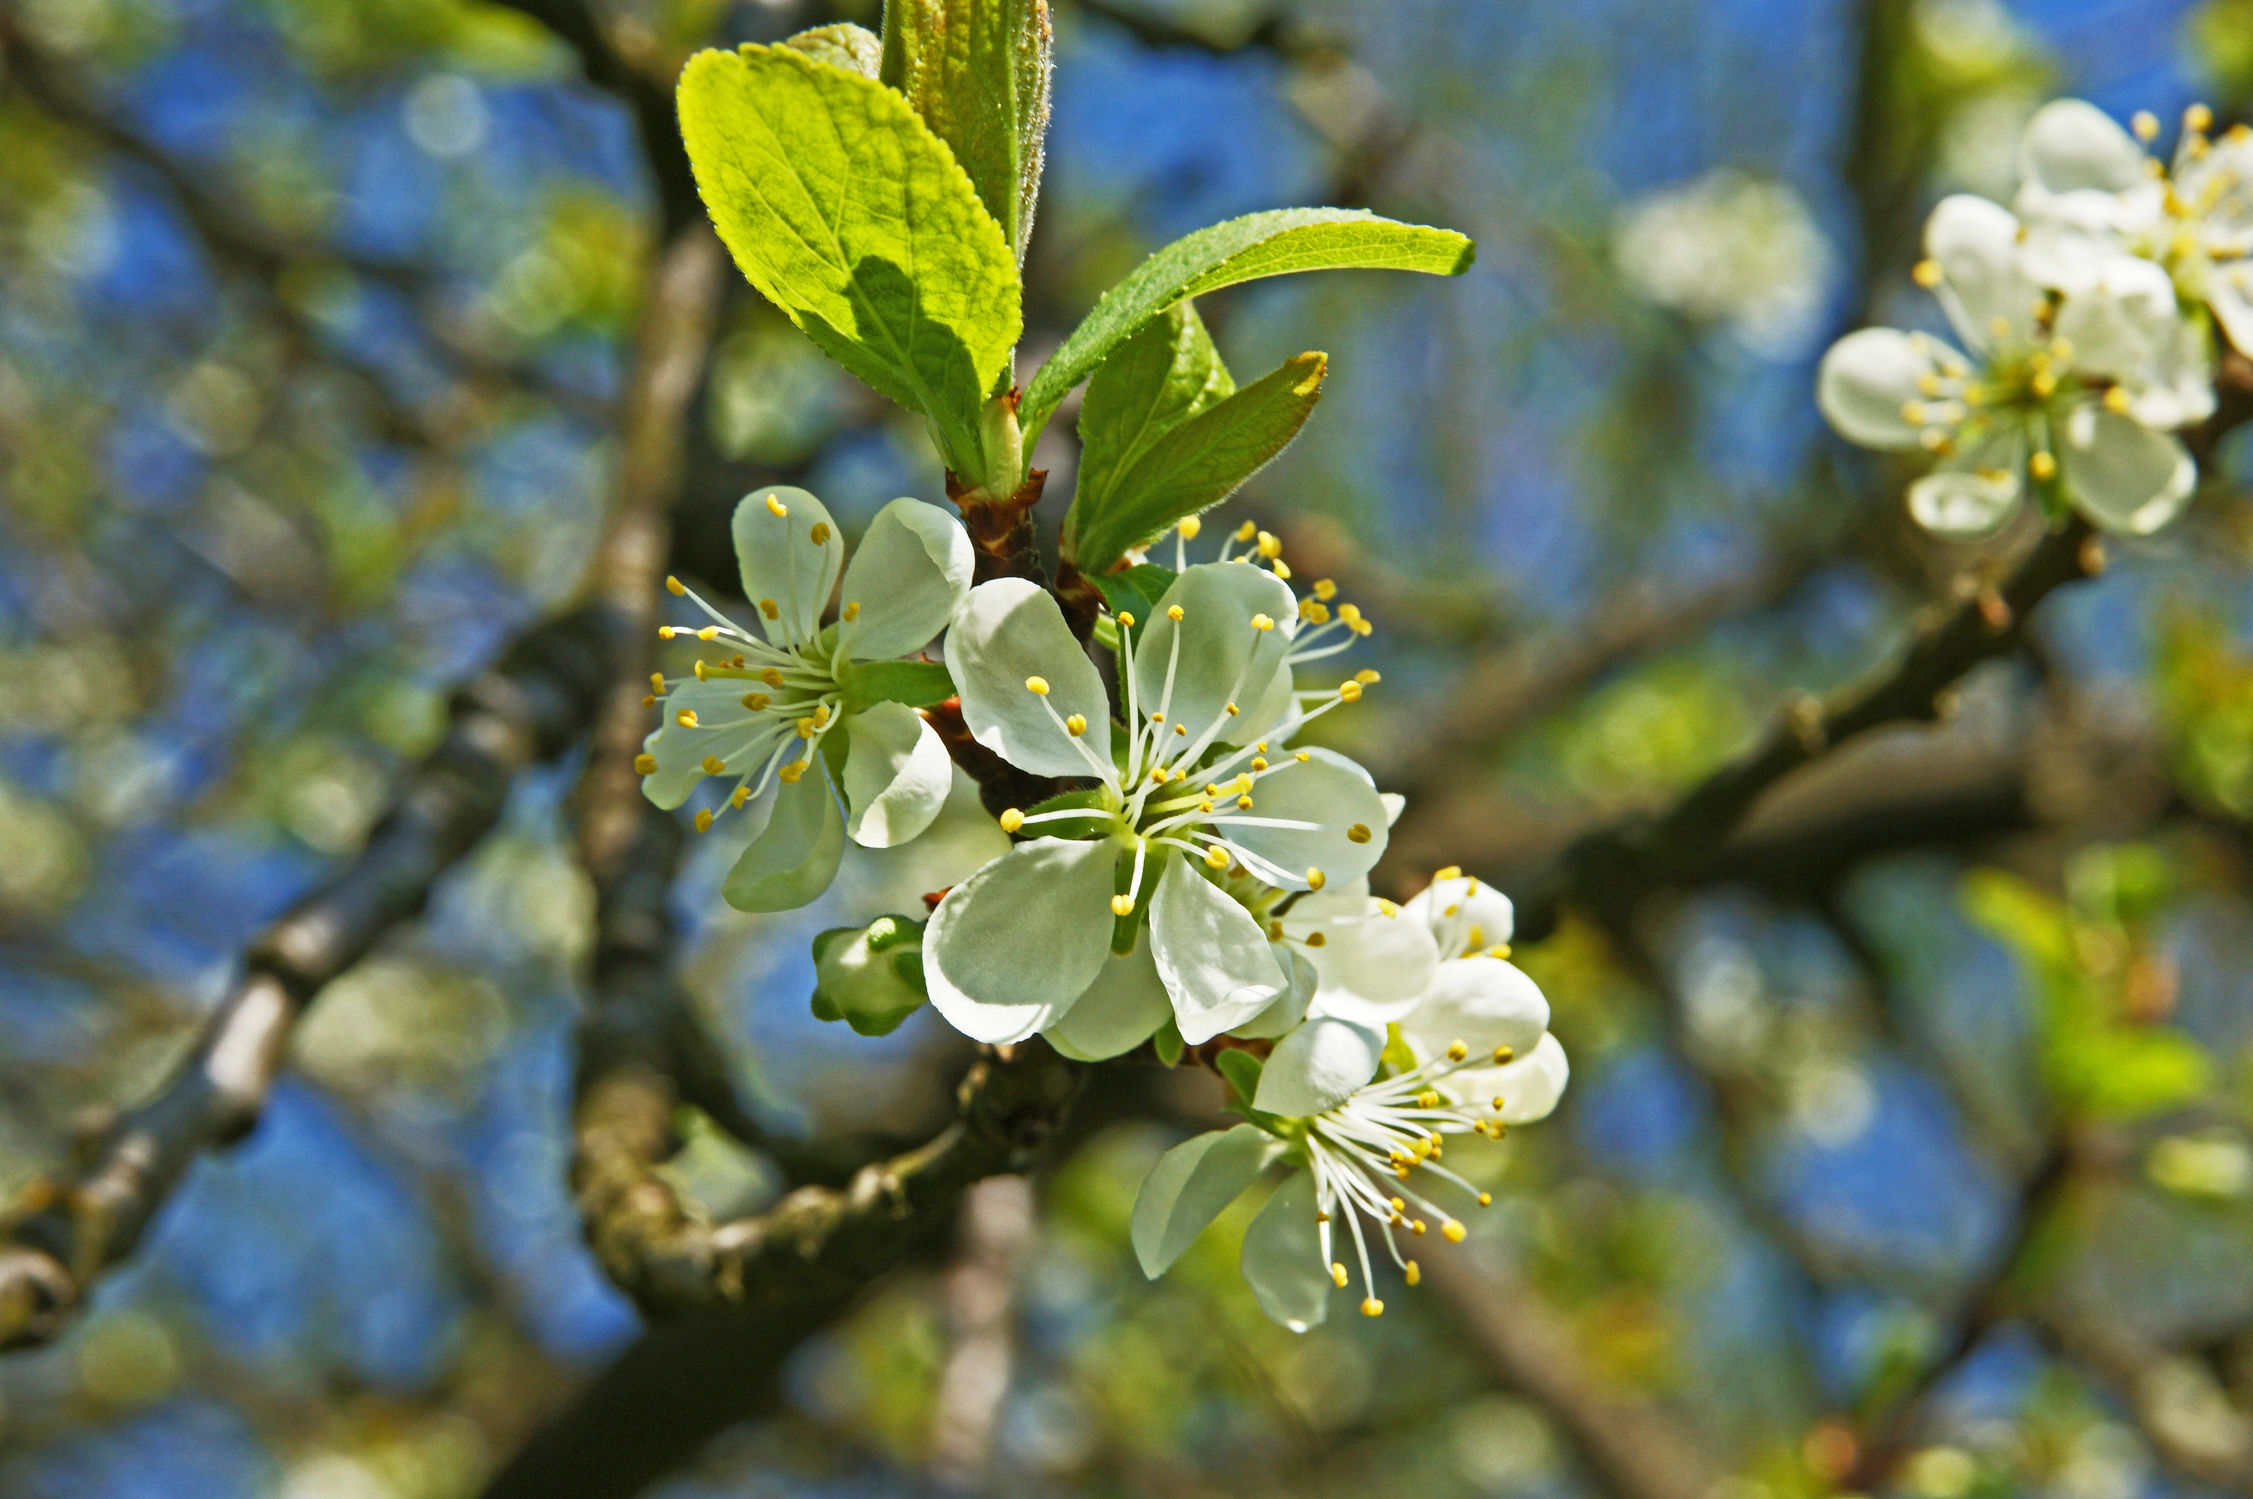 Bild mit Himmel, Bäume, Baum, obstblüten, Blüten, blüte, nahaufnahme, nahaufnahmen